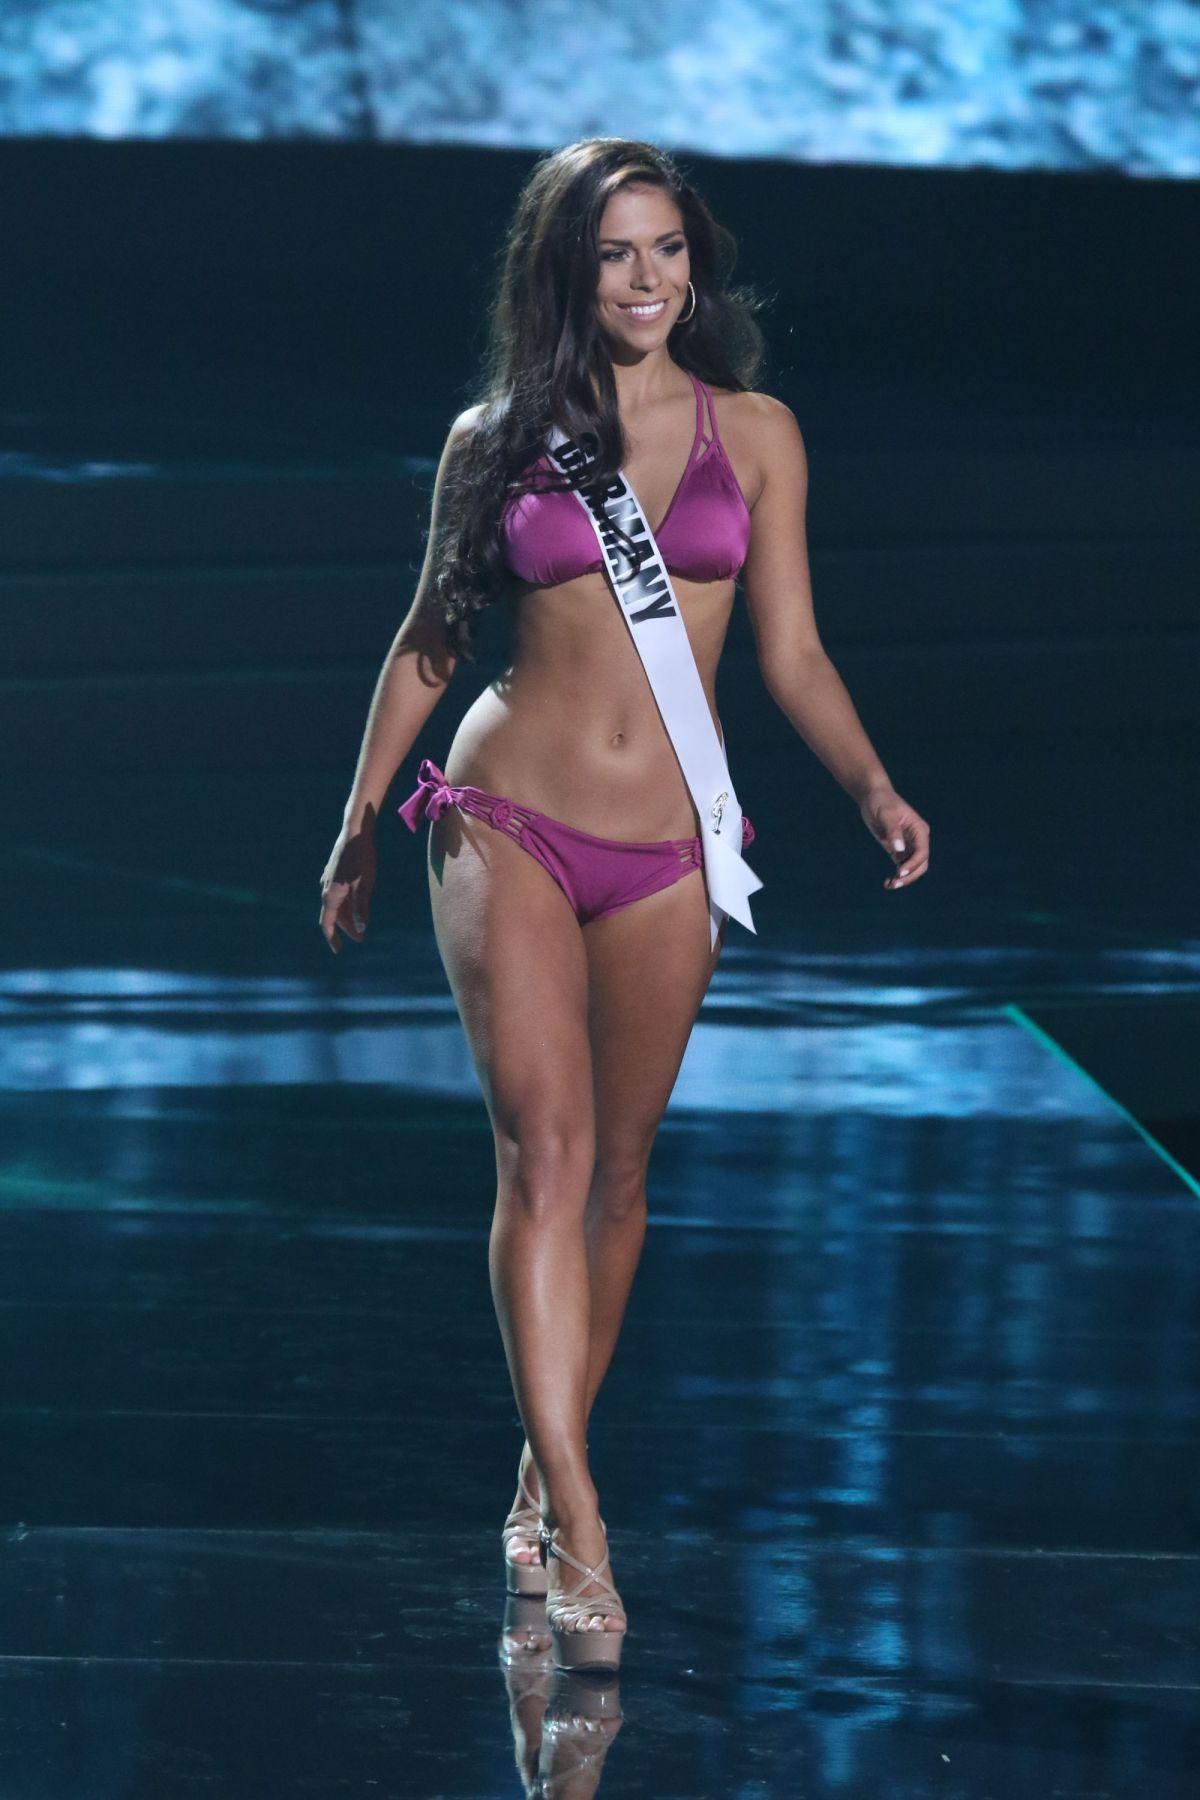 Miss Germany, Sarah-Lorraine Riek 2